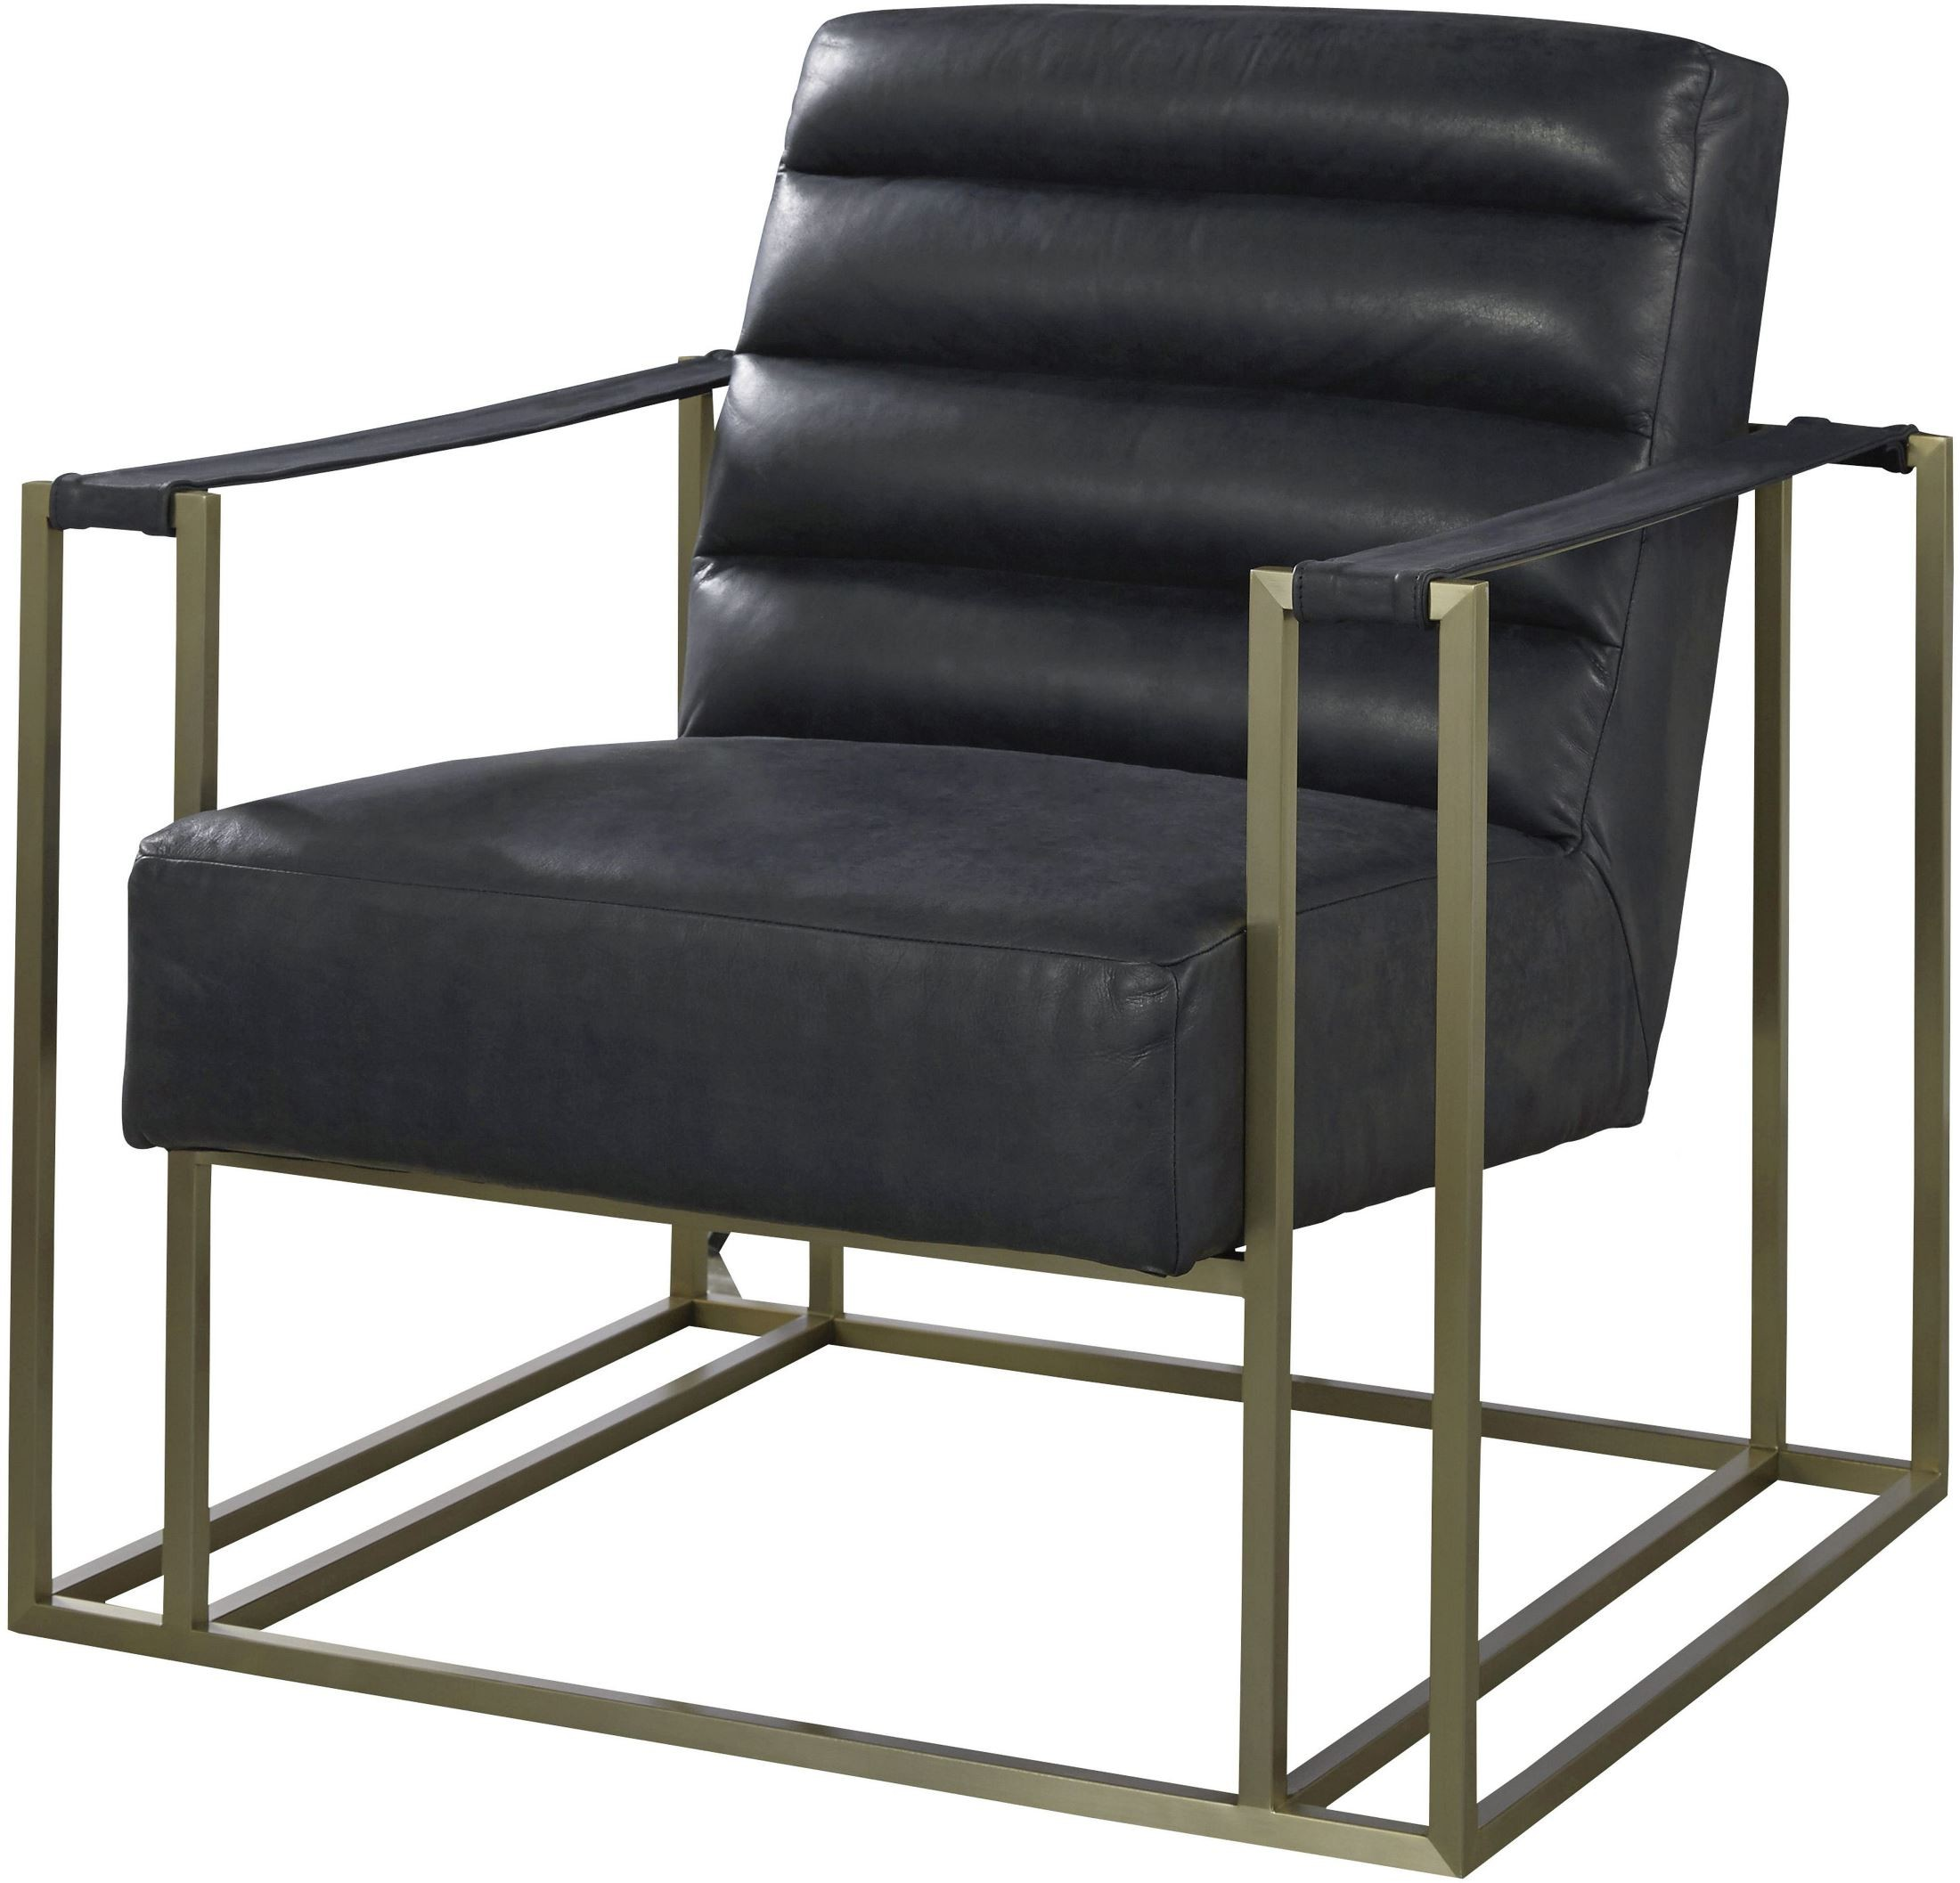 Jensen Black Accent Chair 687535 653 Universal